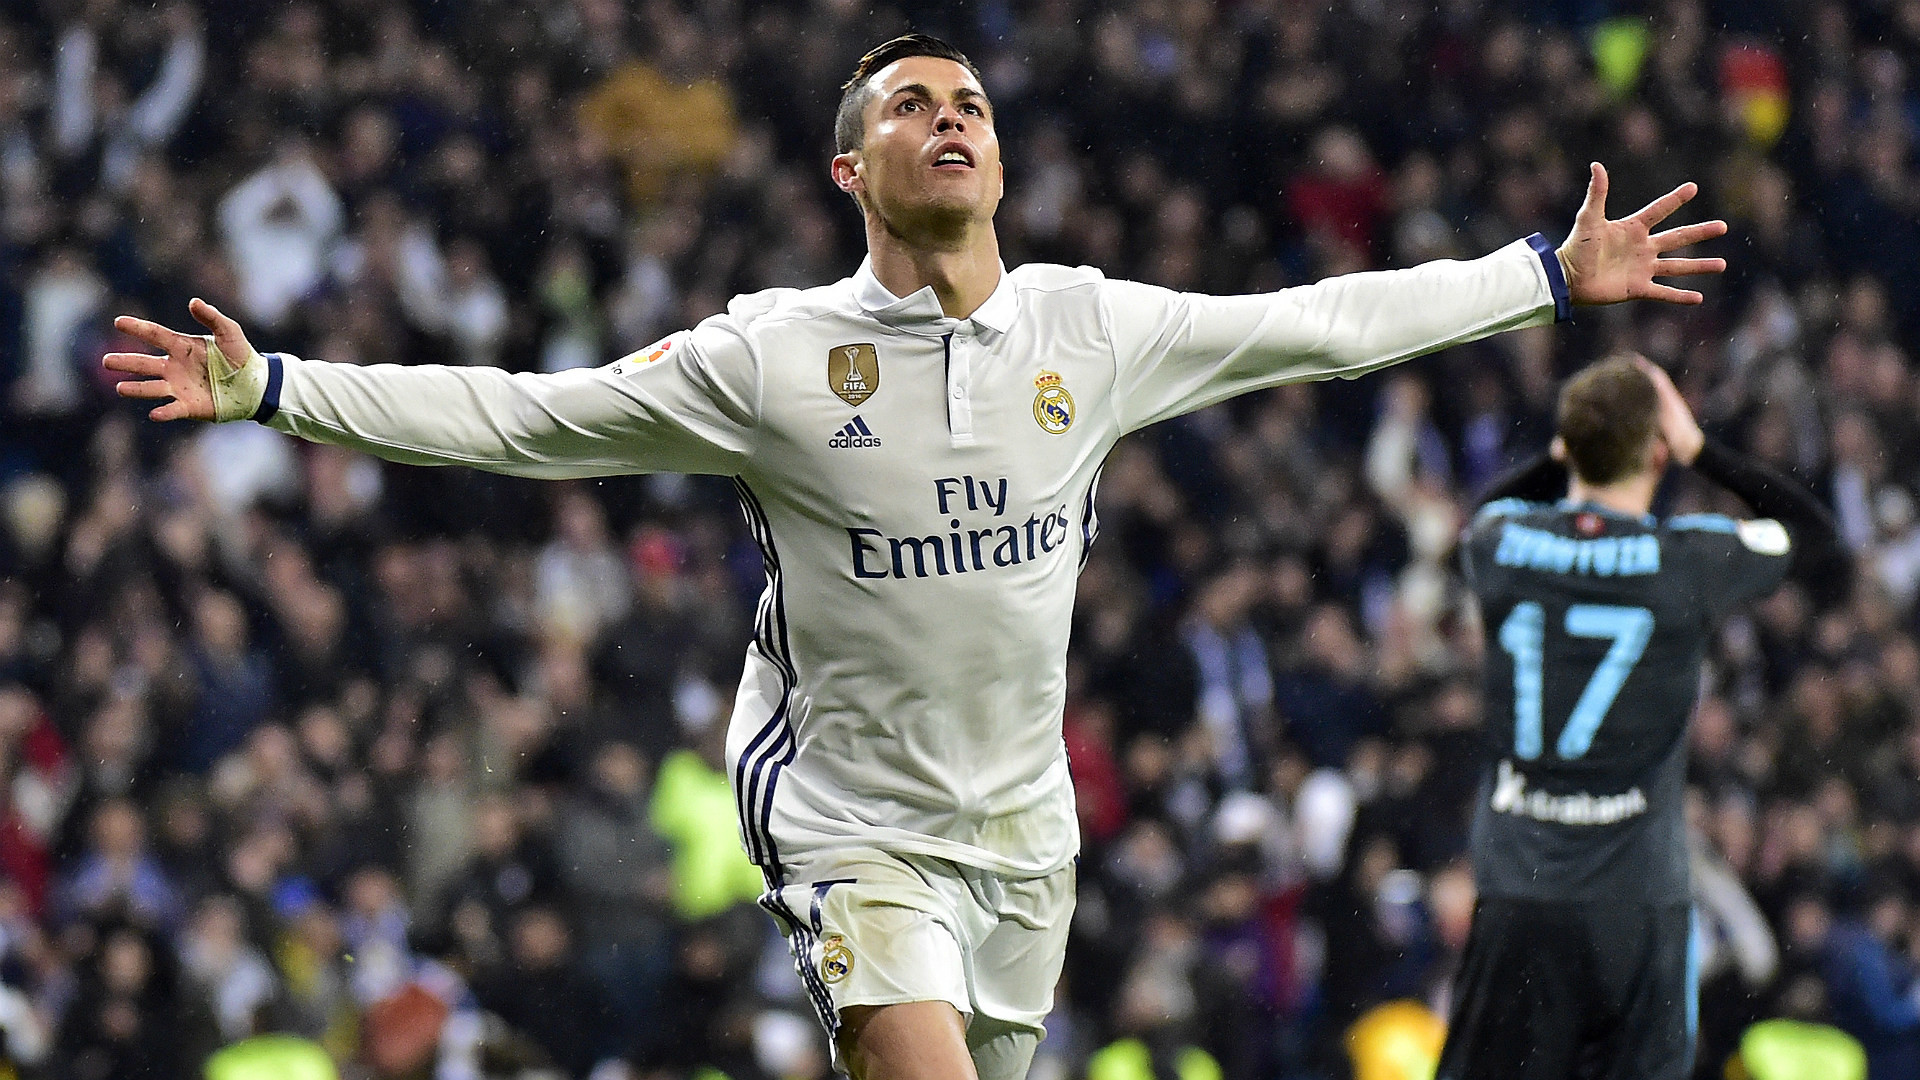 Cristiano Ronaldo Wallpaper 2018 Real Madrid 74 Pictures